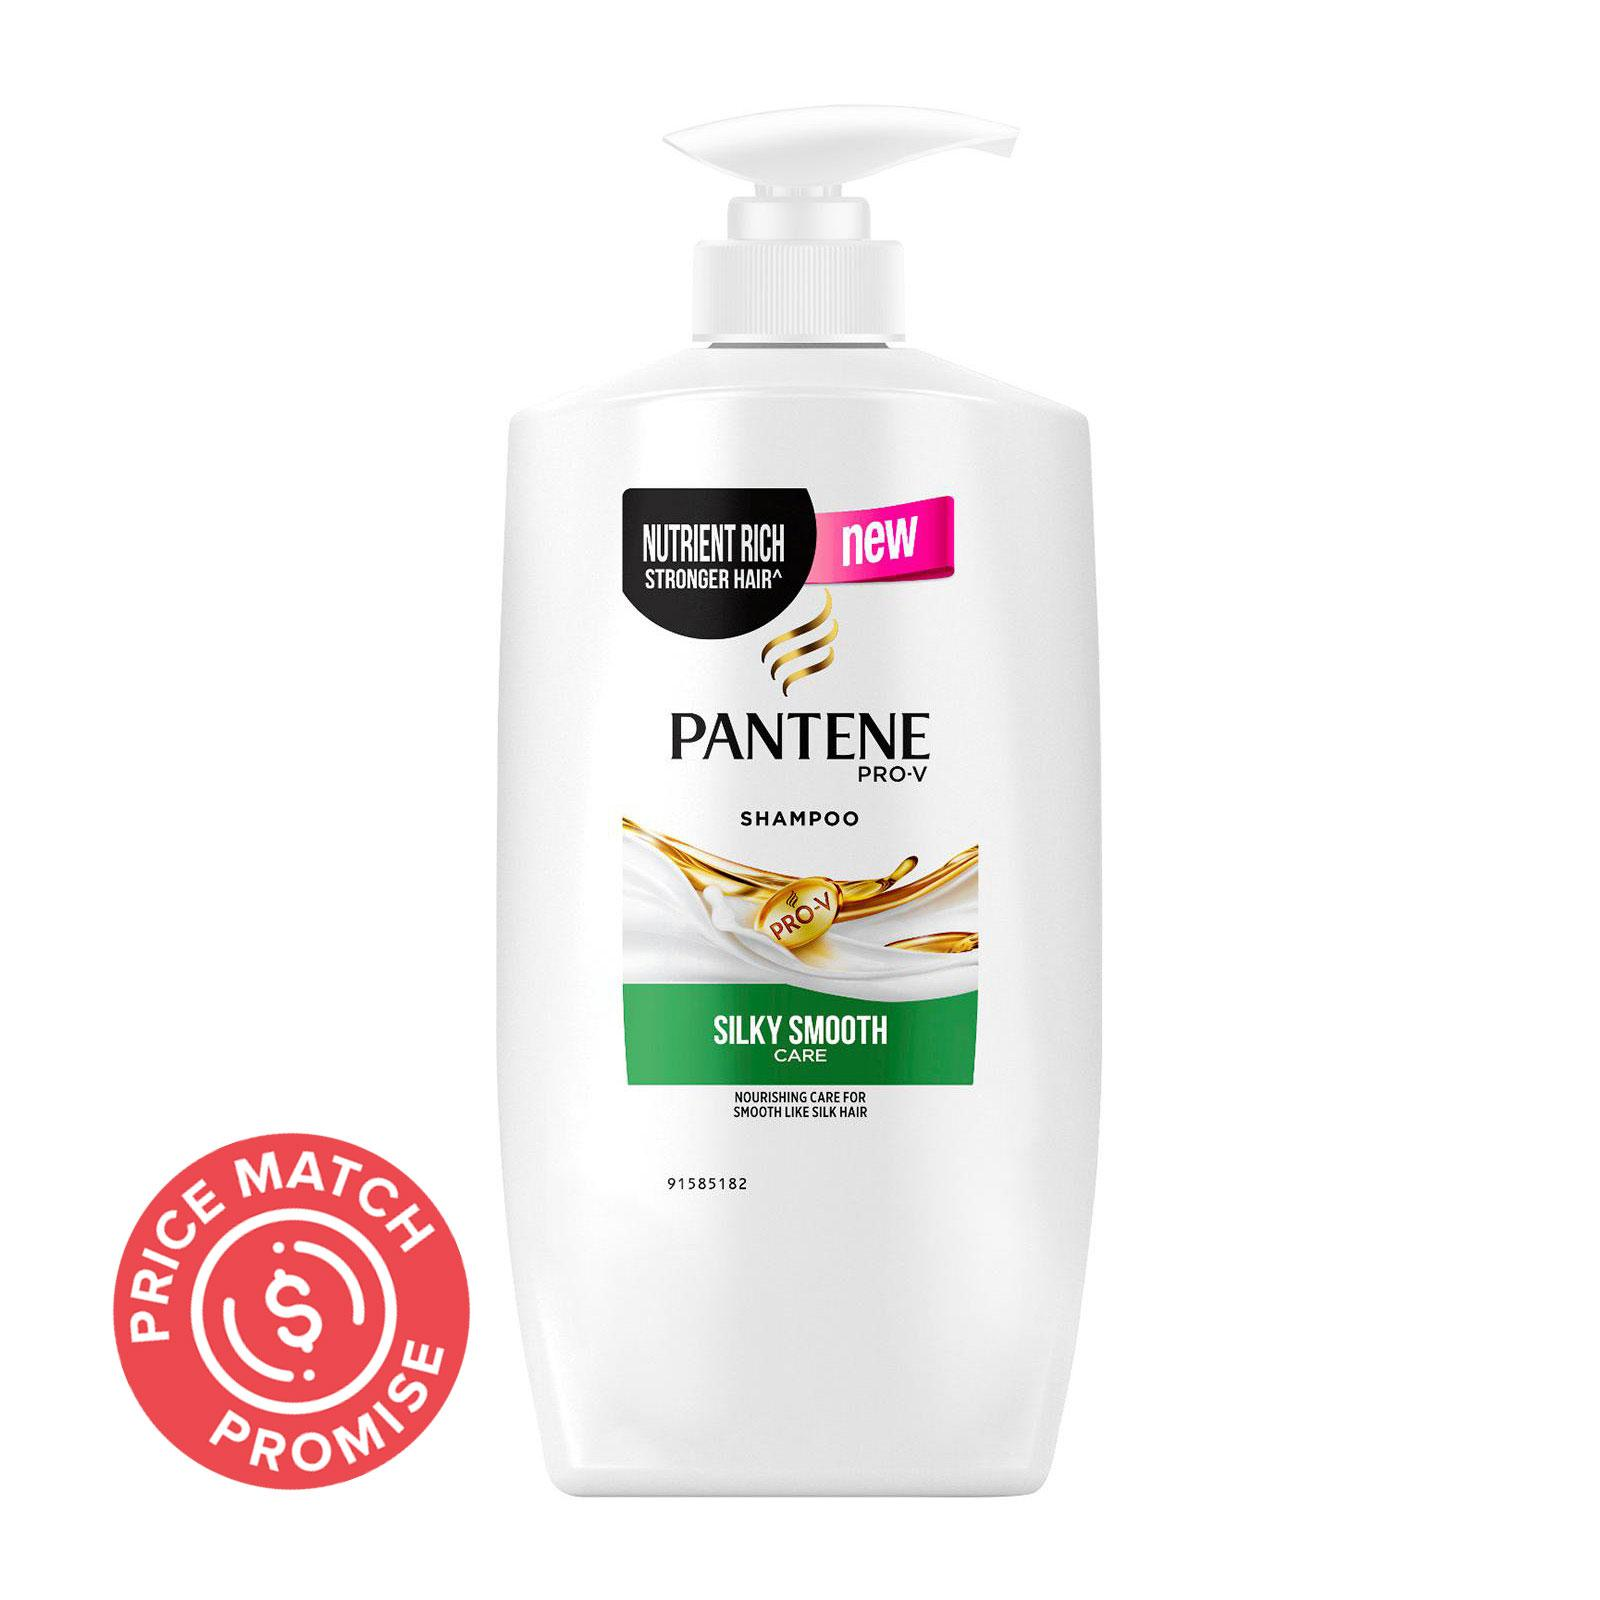 PANTENE Silky Smooth Care Shampoo 750ml